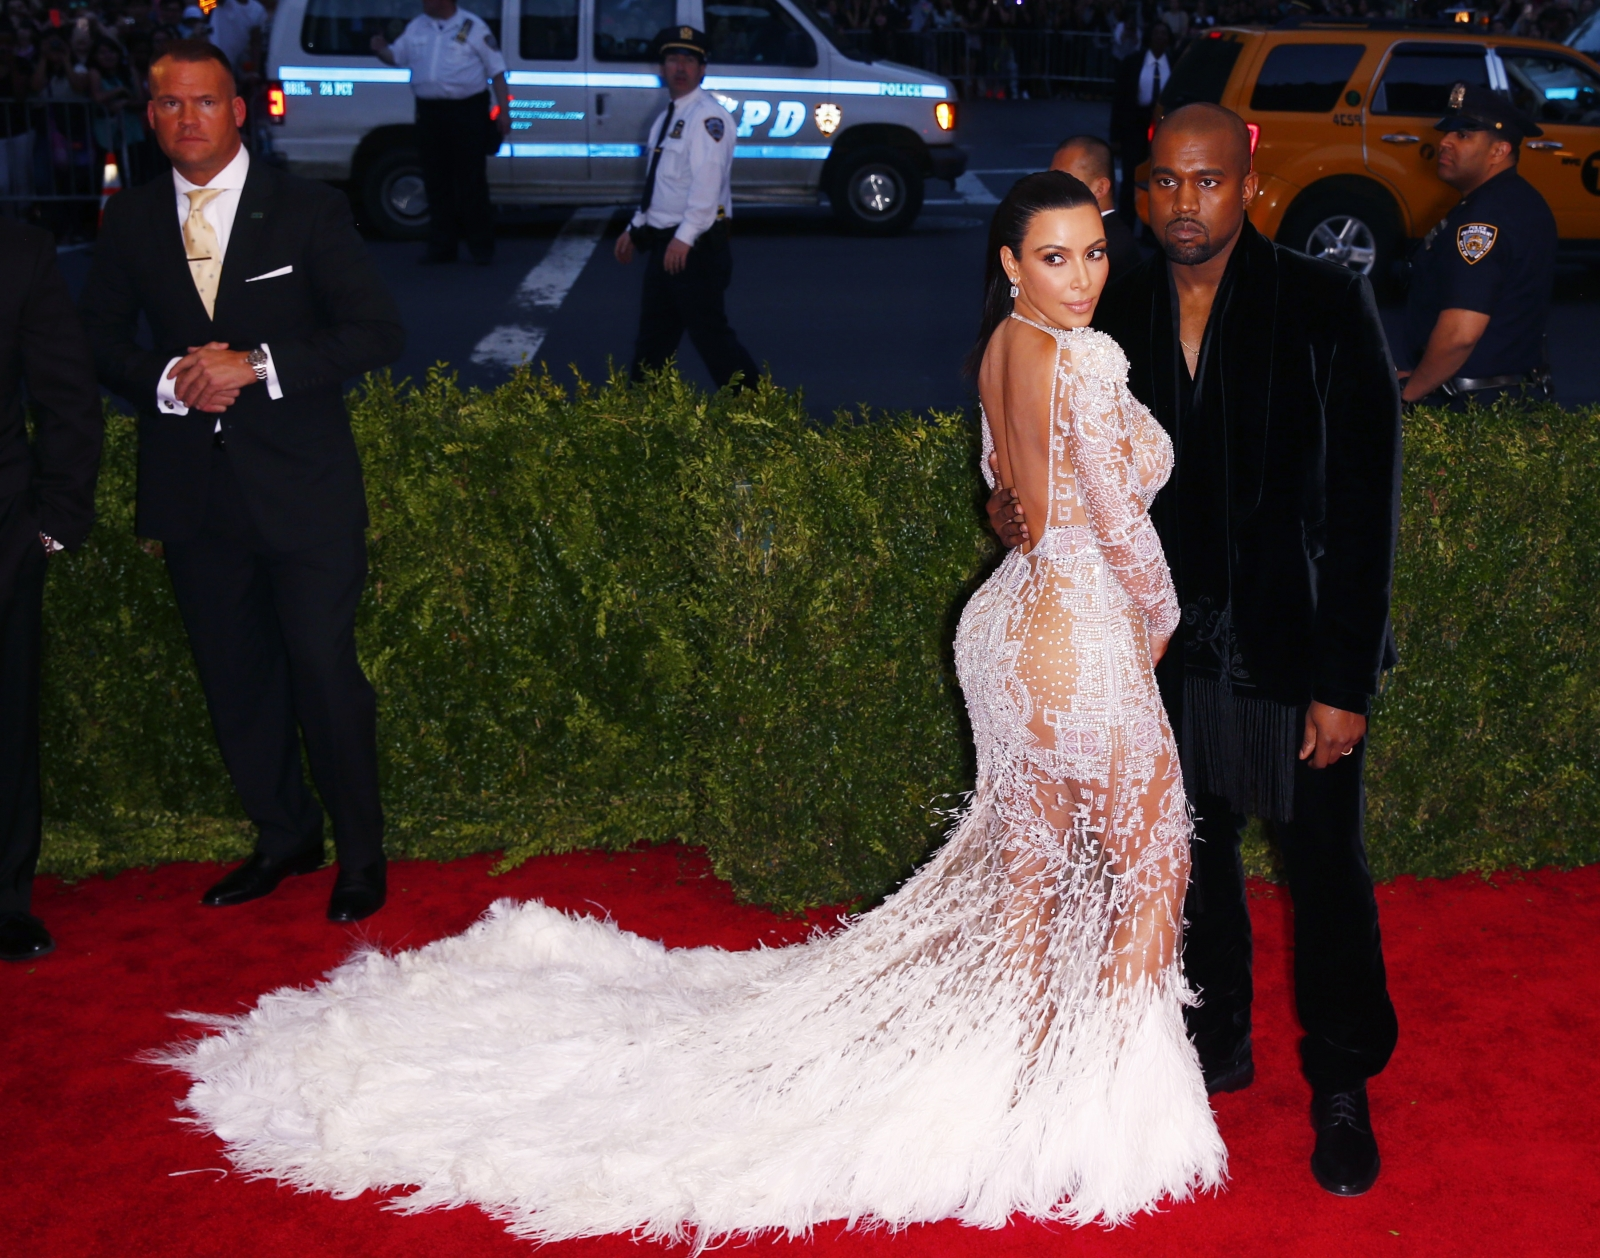 45b7a75755c60 Kim Kardashian and Kanye West wedding anniversary: Body language ...